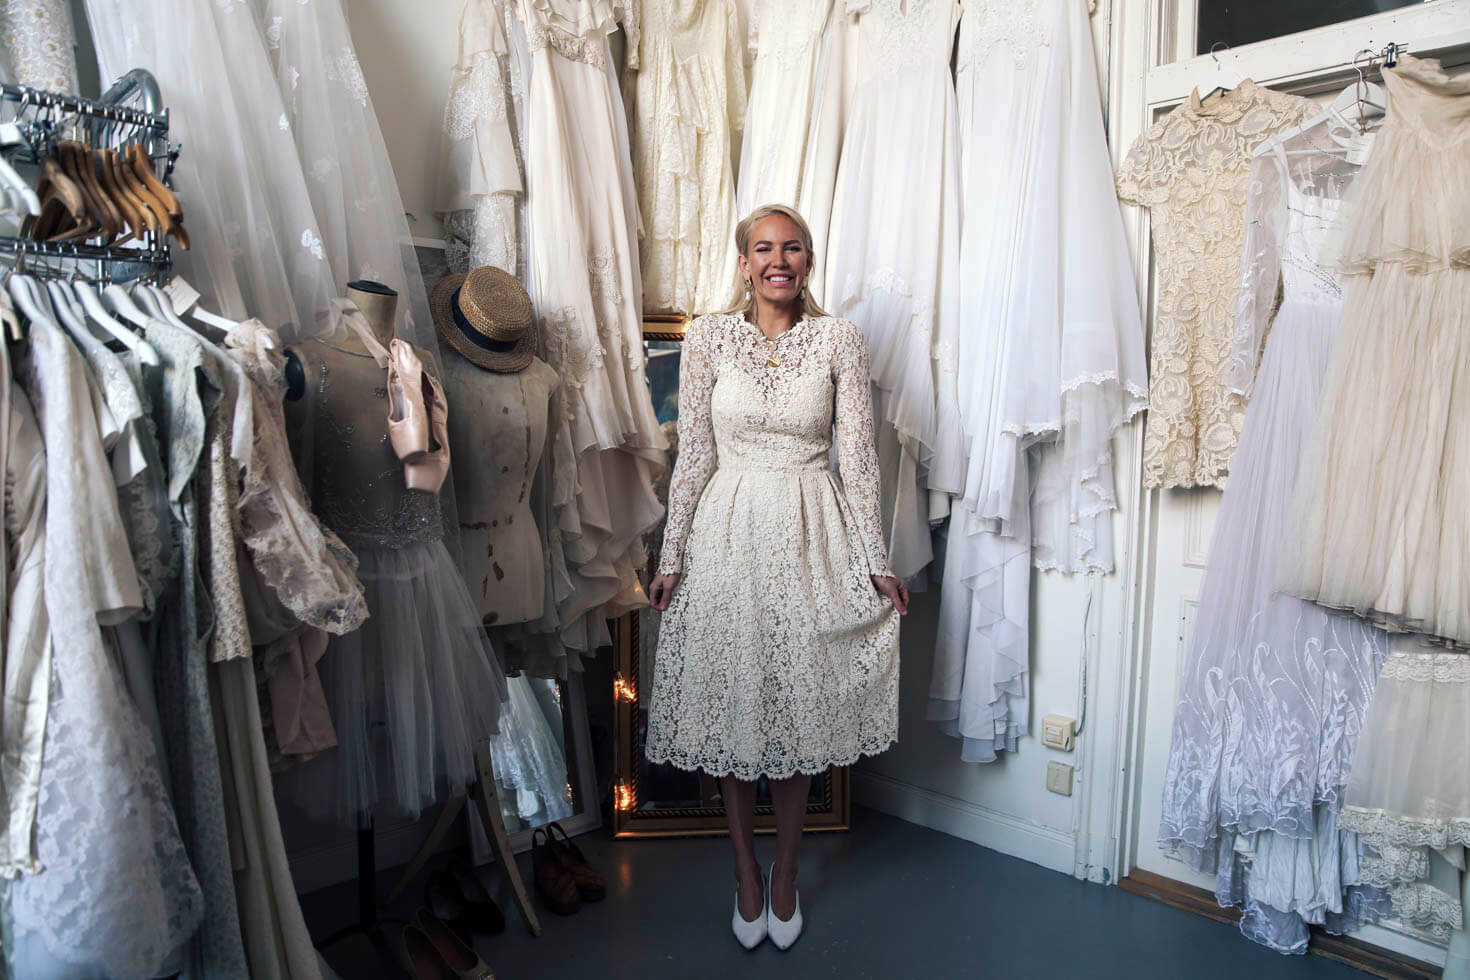 Elsa-Billgren-Vintage-Bröllop-